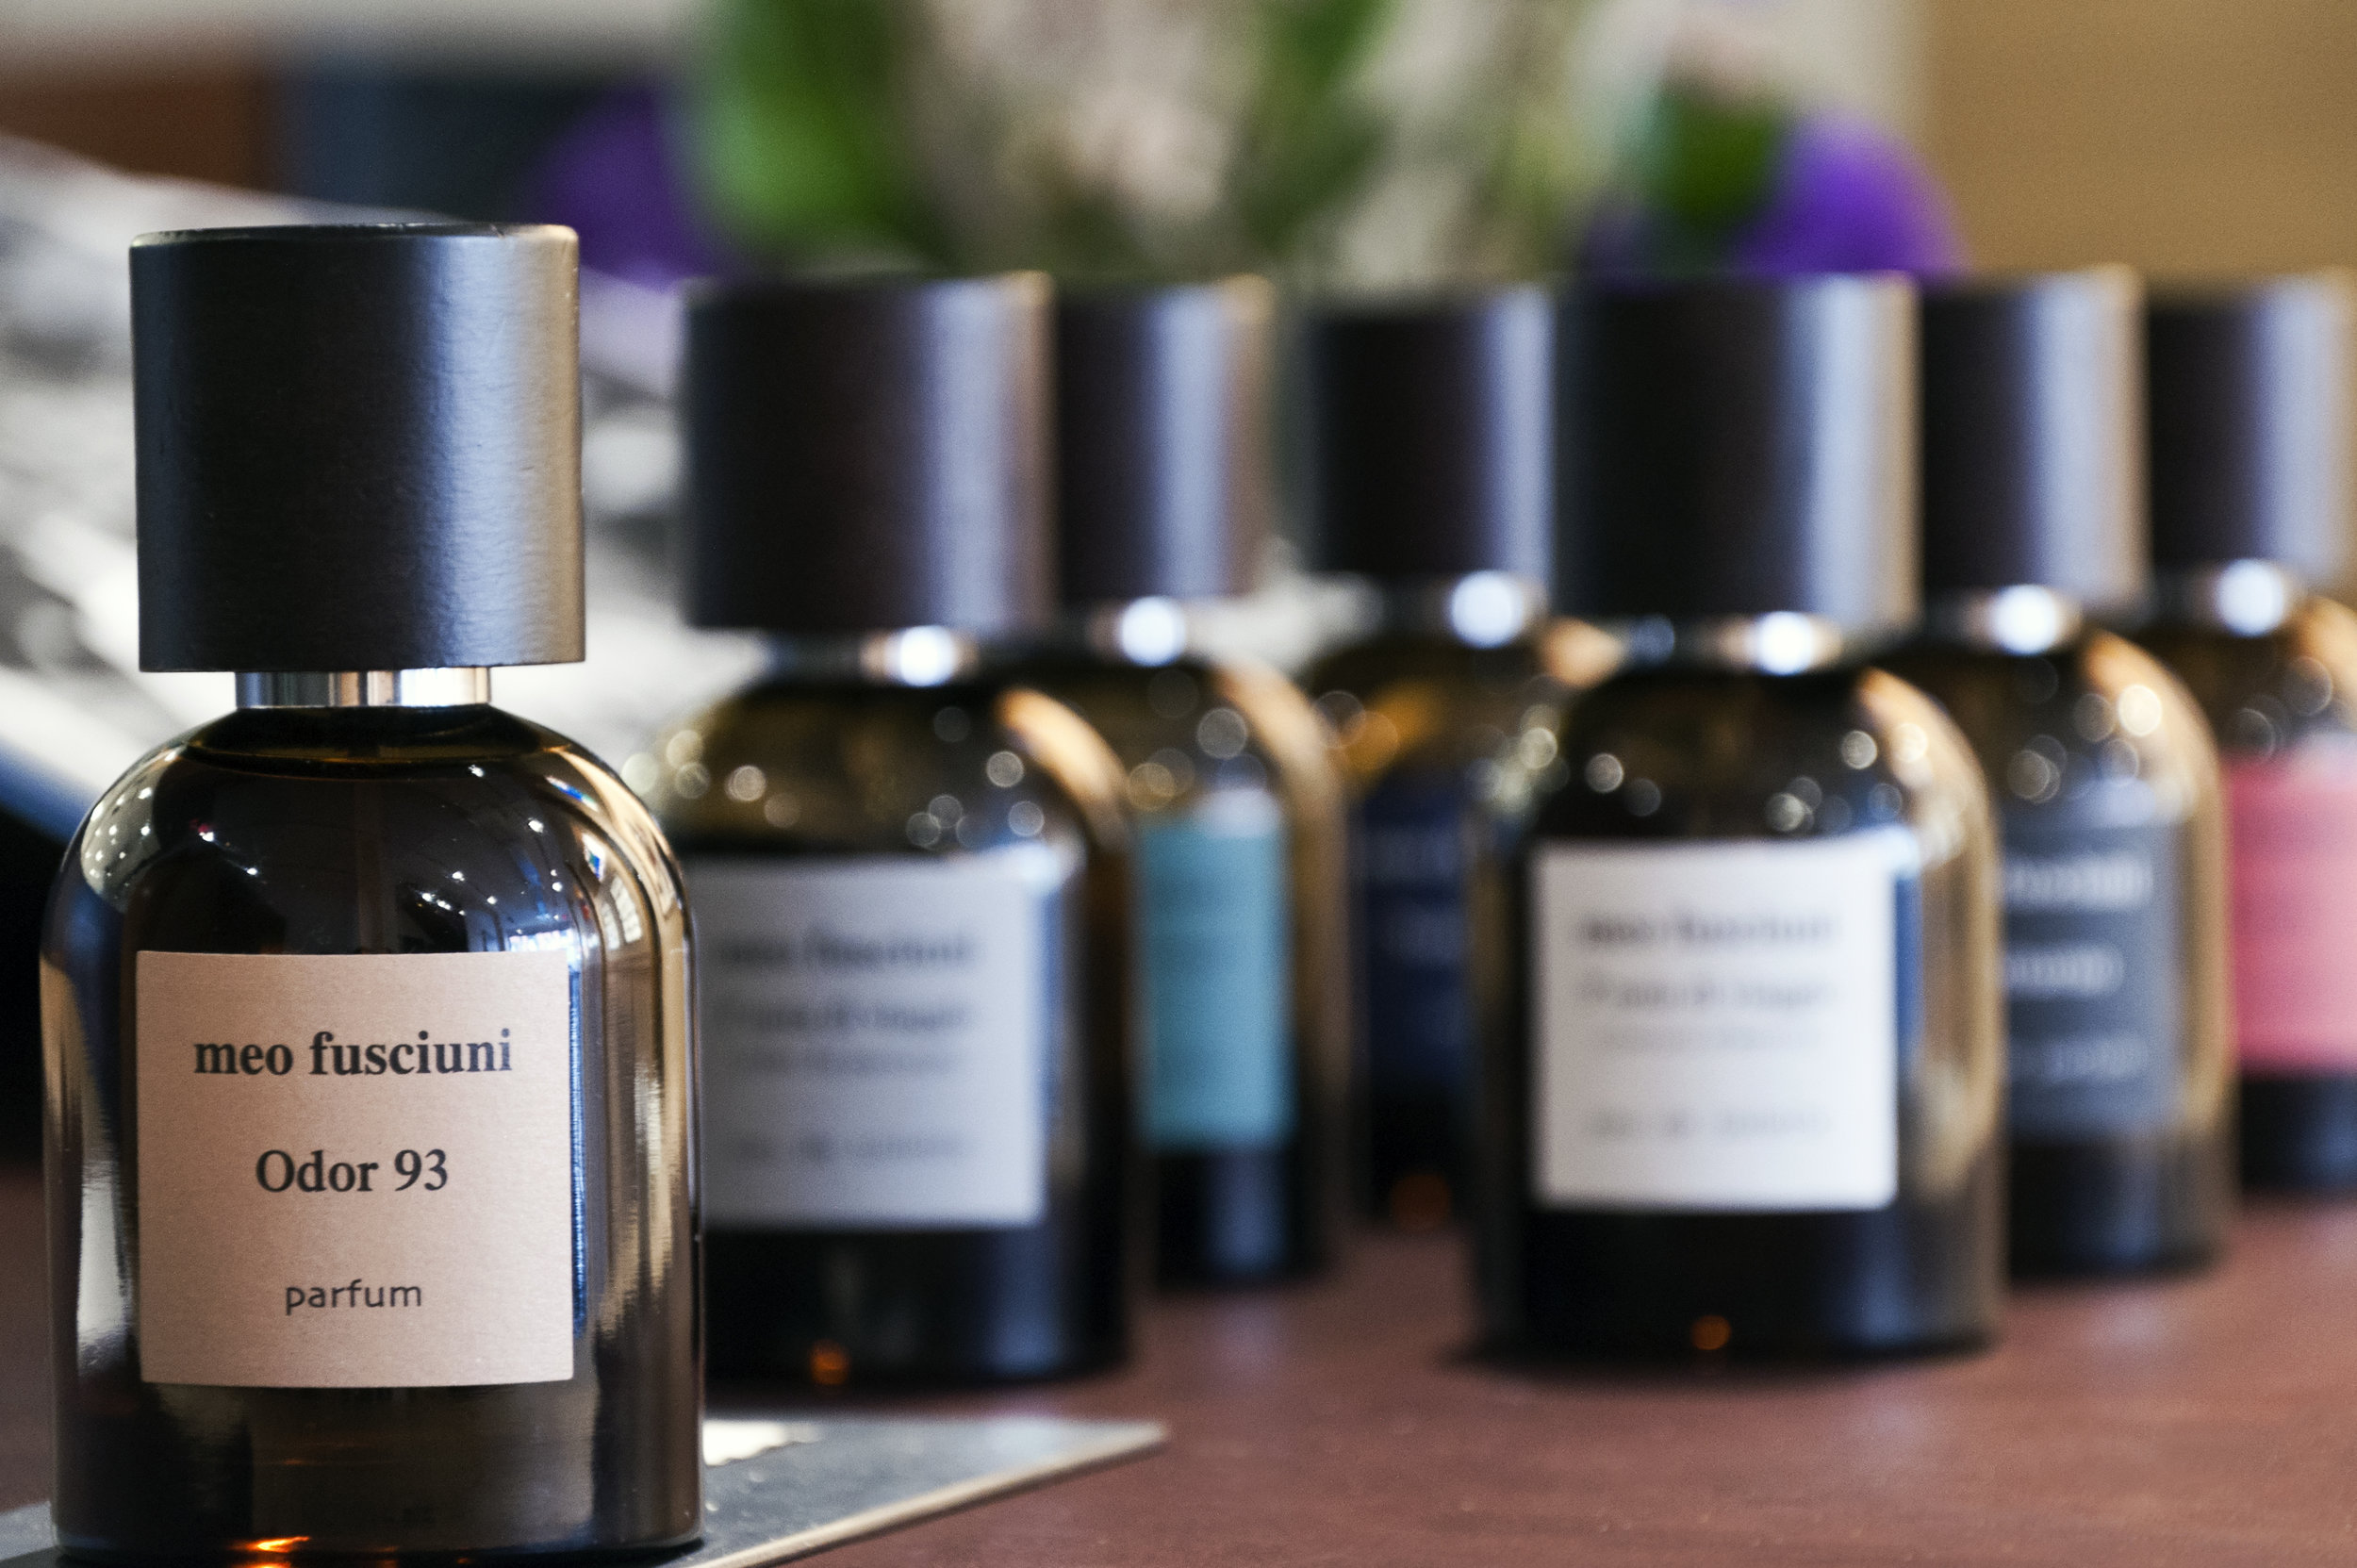 Meo Fusciuni personal fragrances from Italy $185 - $250